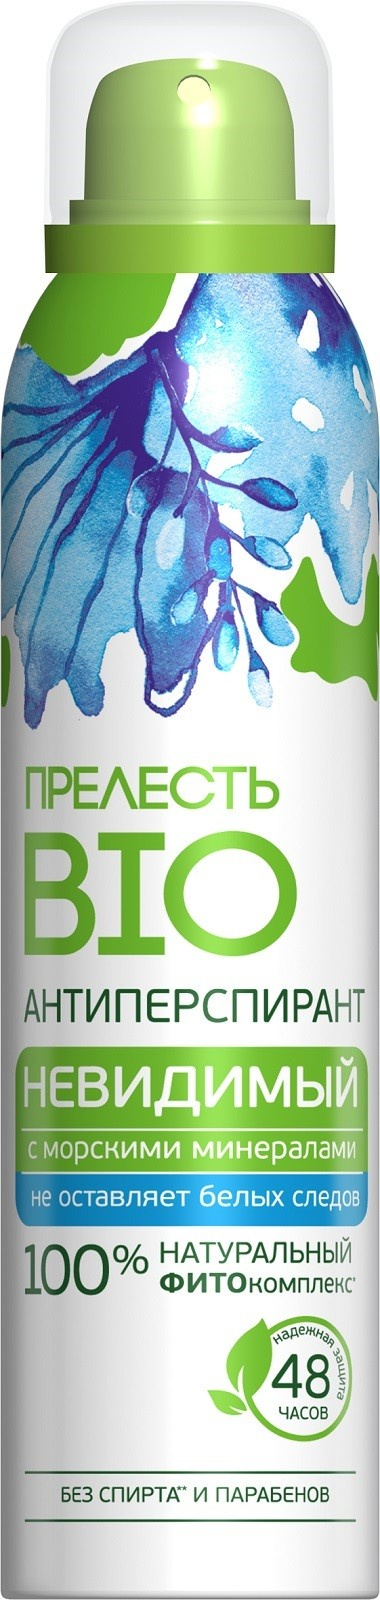 Дезодорант-антиперспирант Прелесть Bio